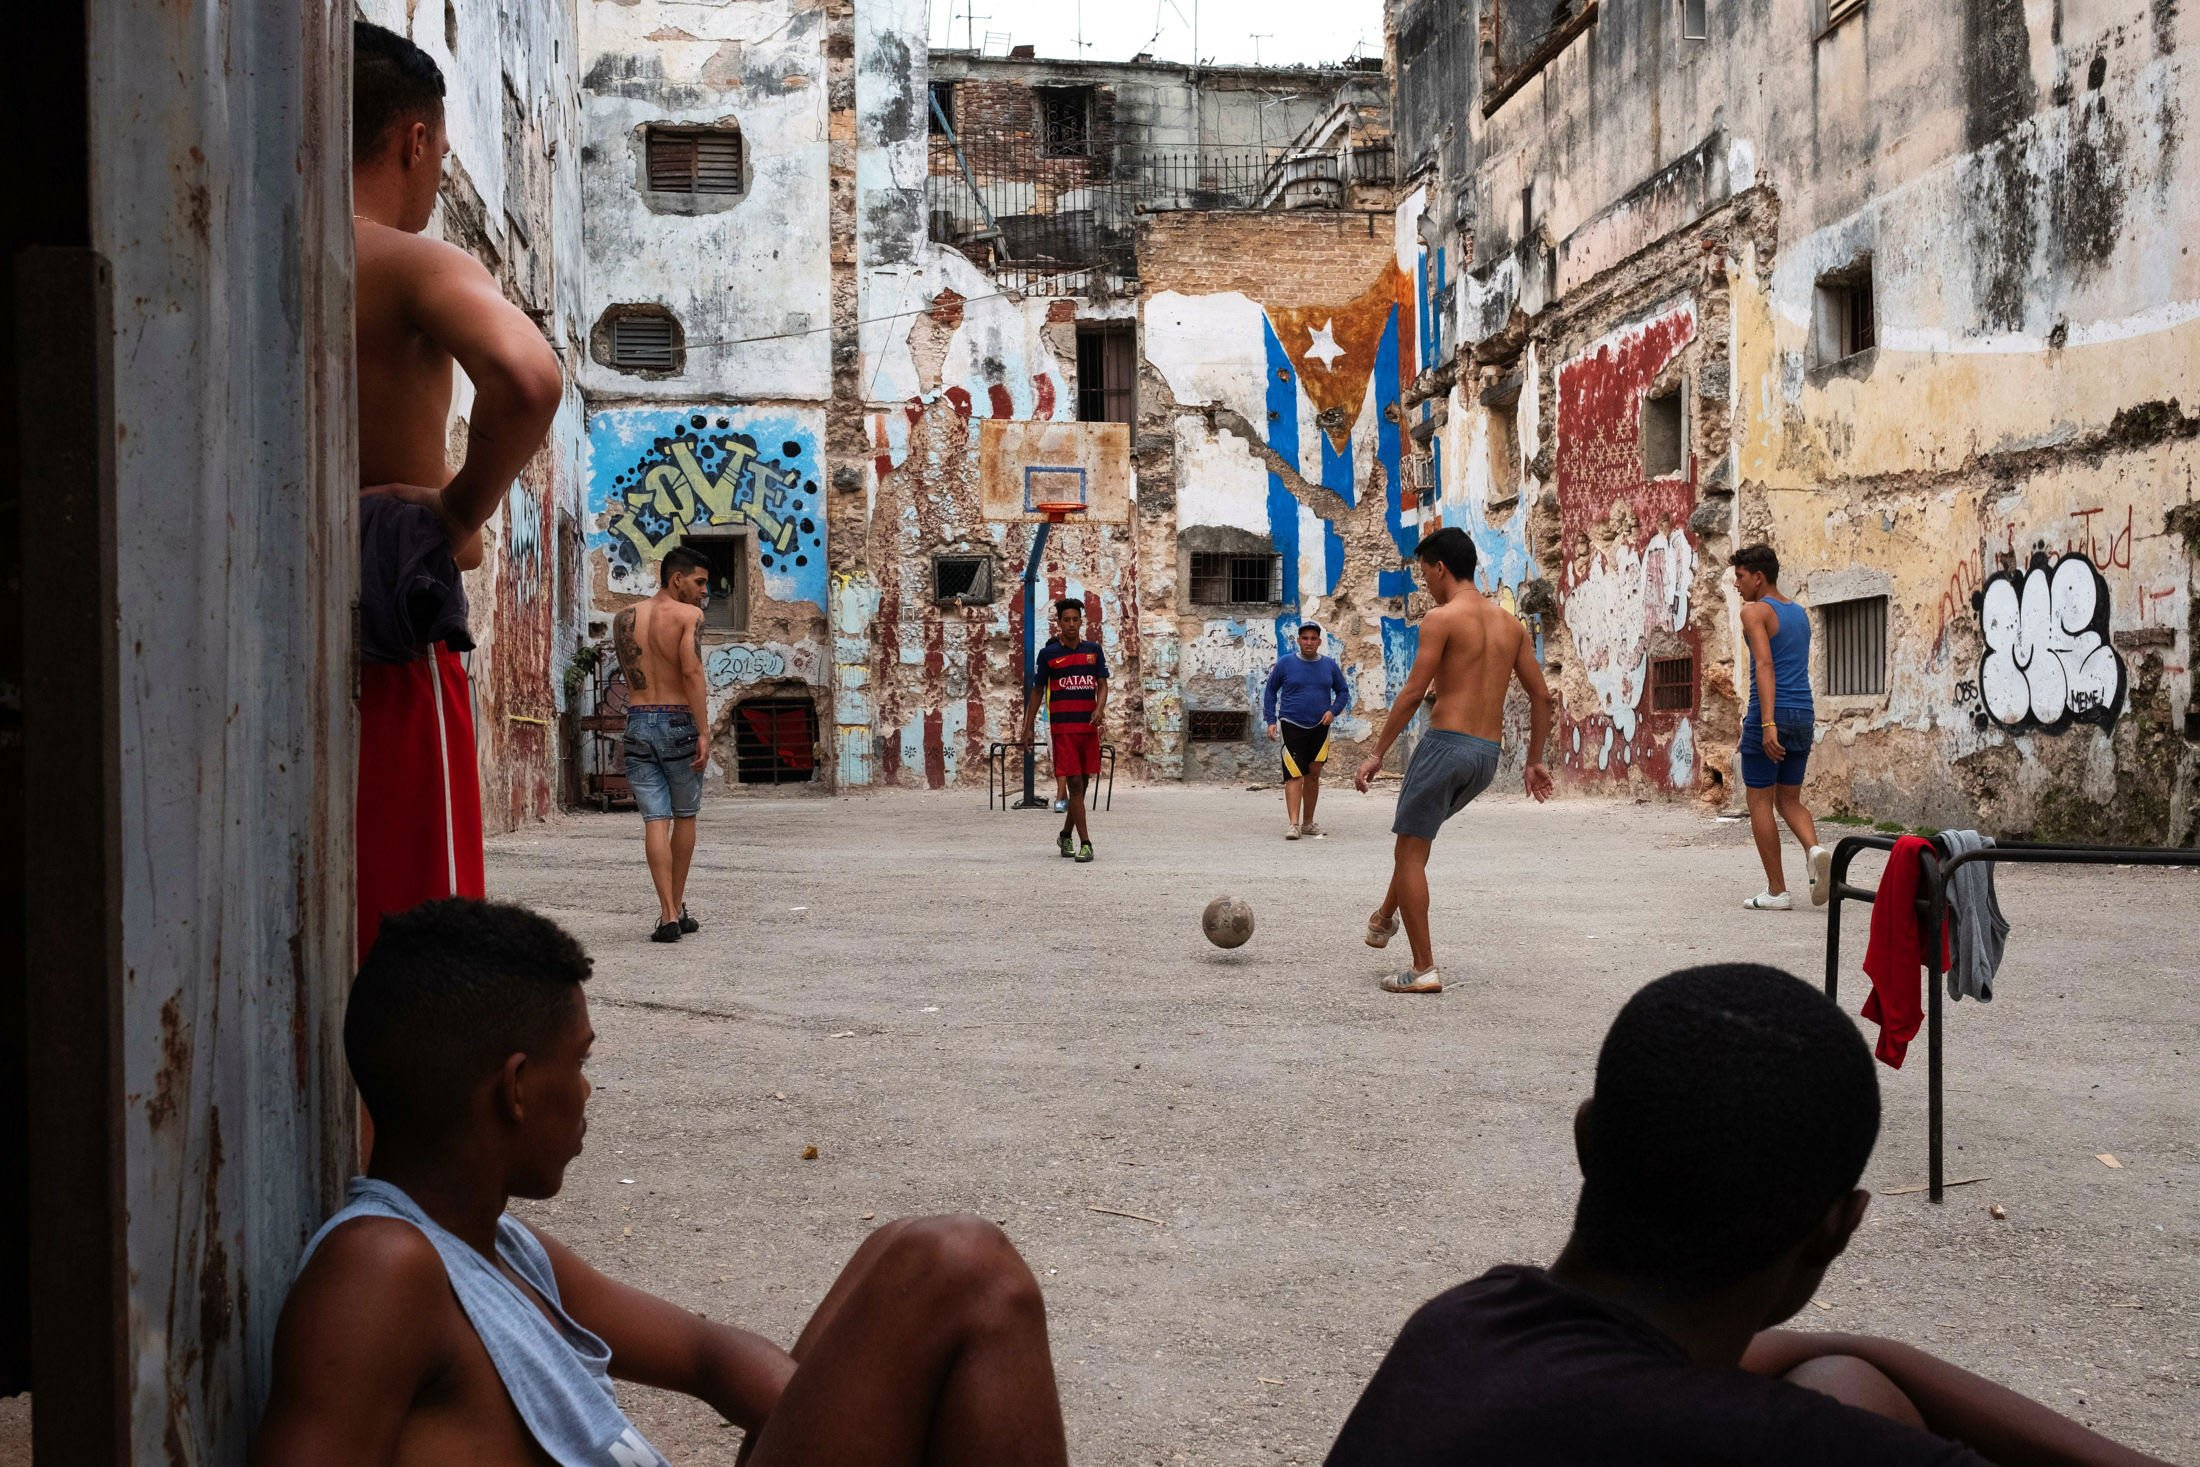 boys playing football in a yard in Havana